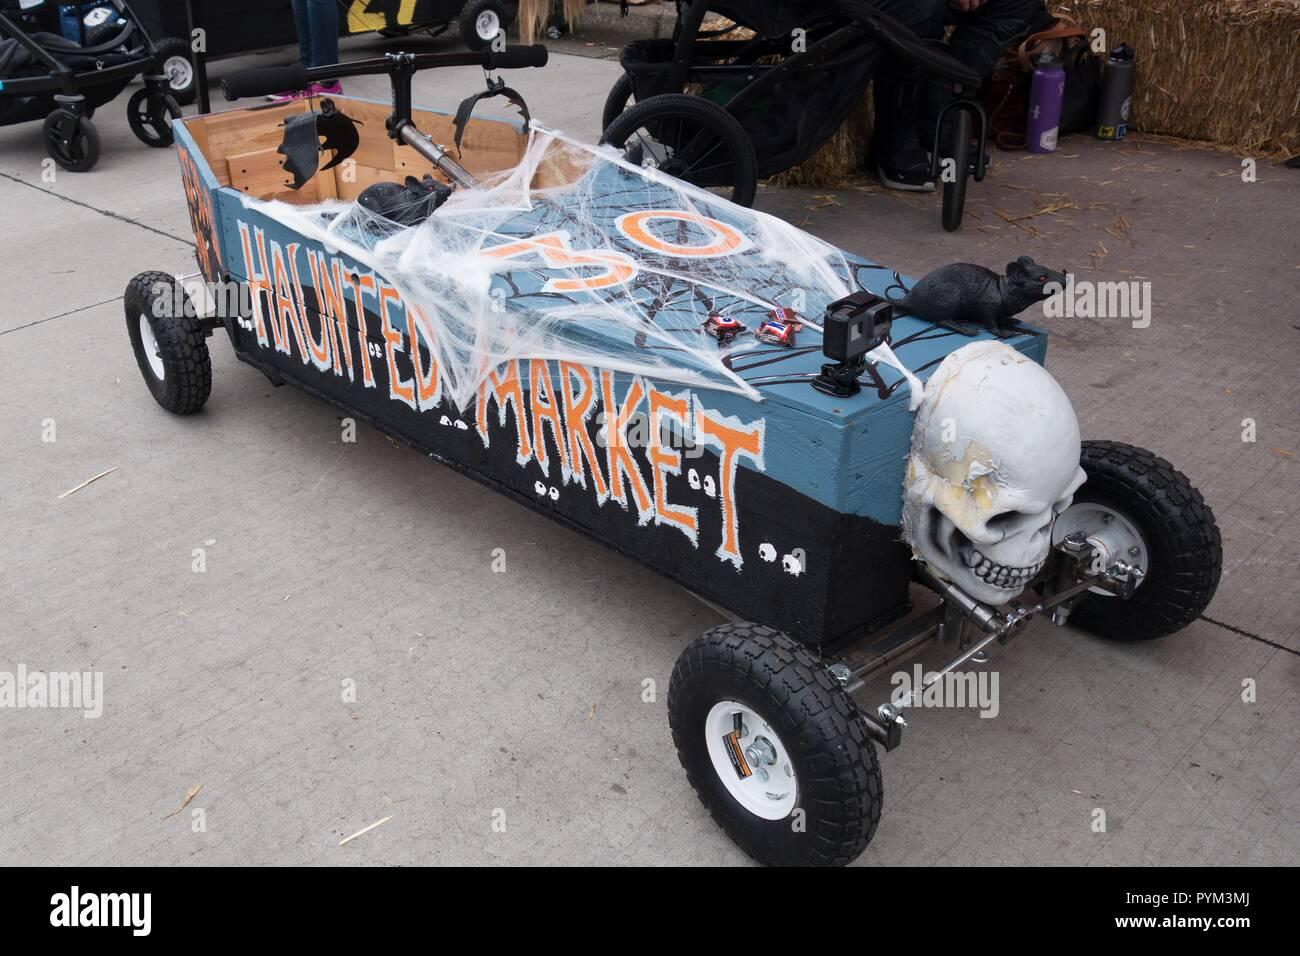 Go Kart Stock Photos & Go Kart Stock Images - Alamy